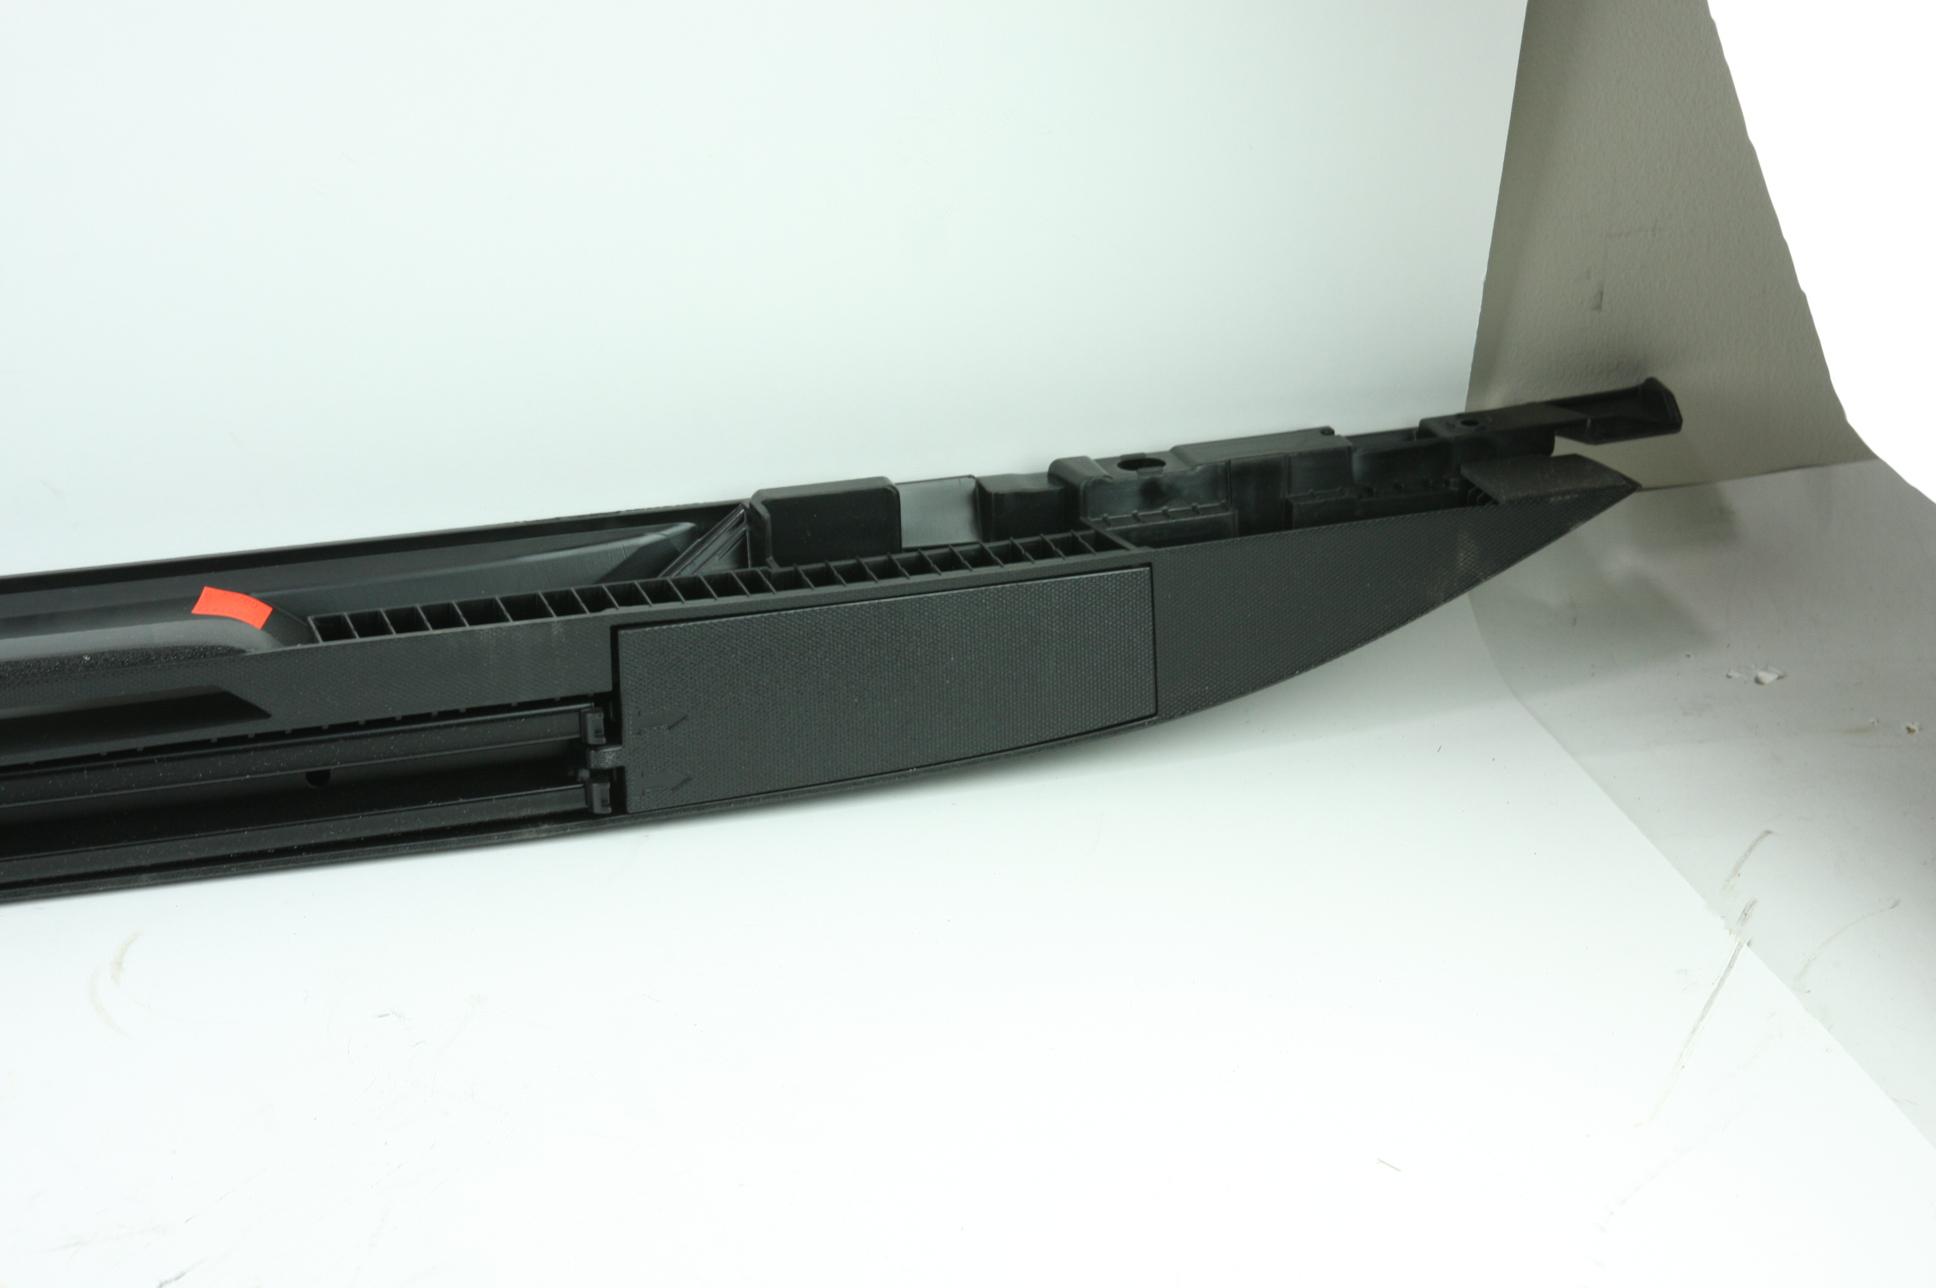 *** New Genuine OEM 23324213 GM Roof Rack Luggage Carrier Side Rail LH 84016250 - image 8